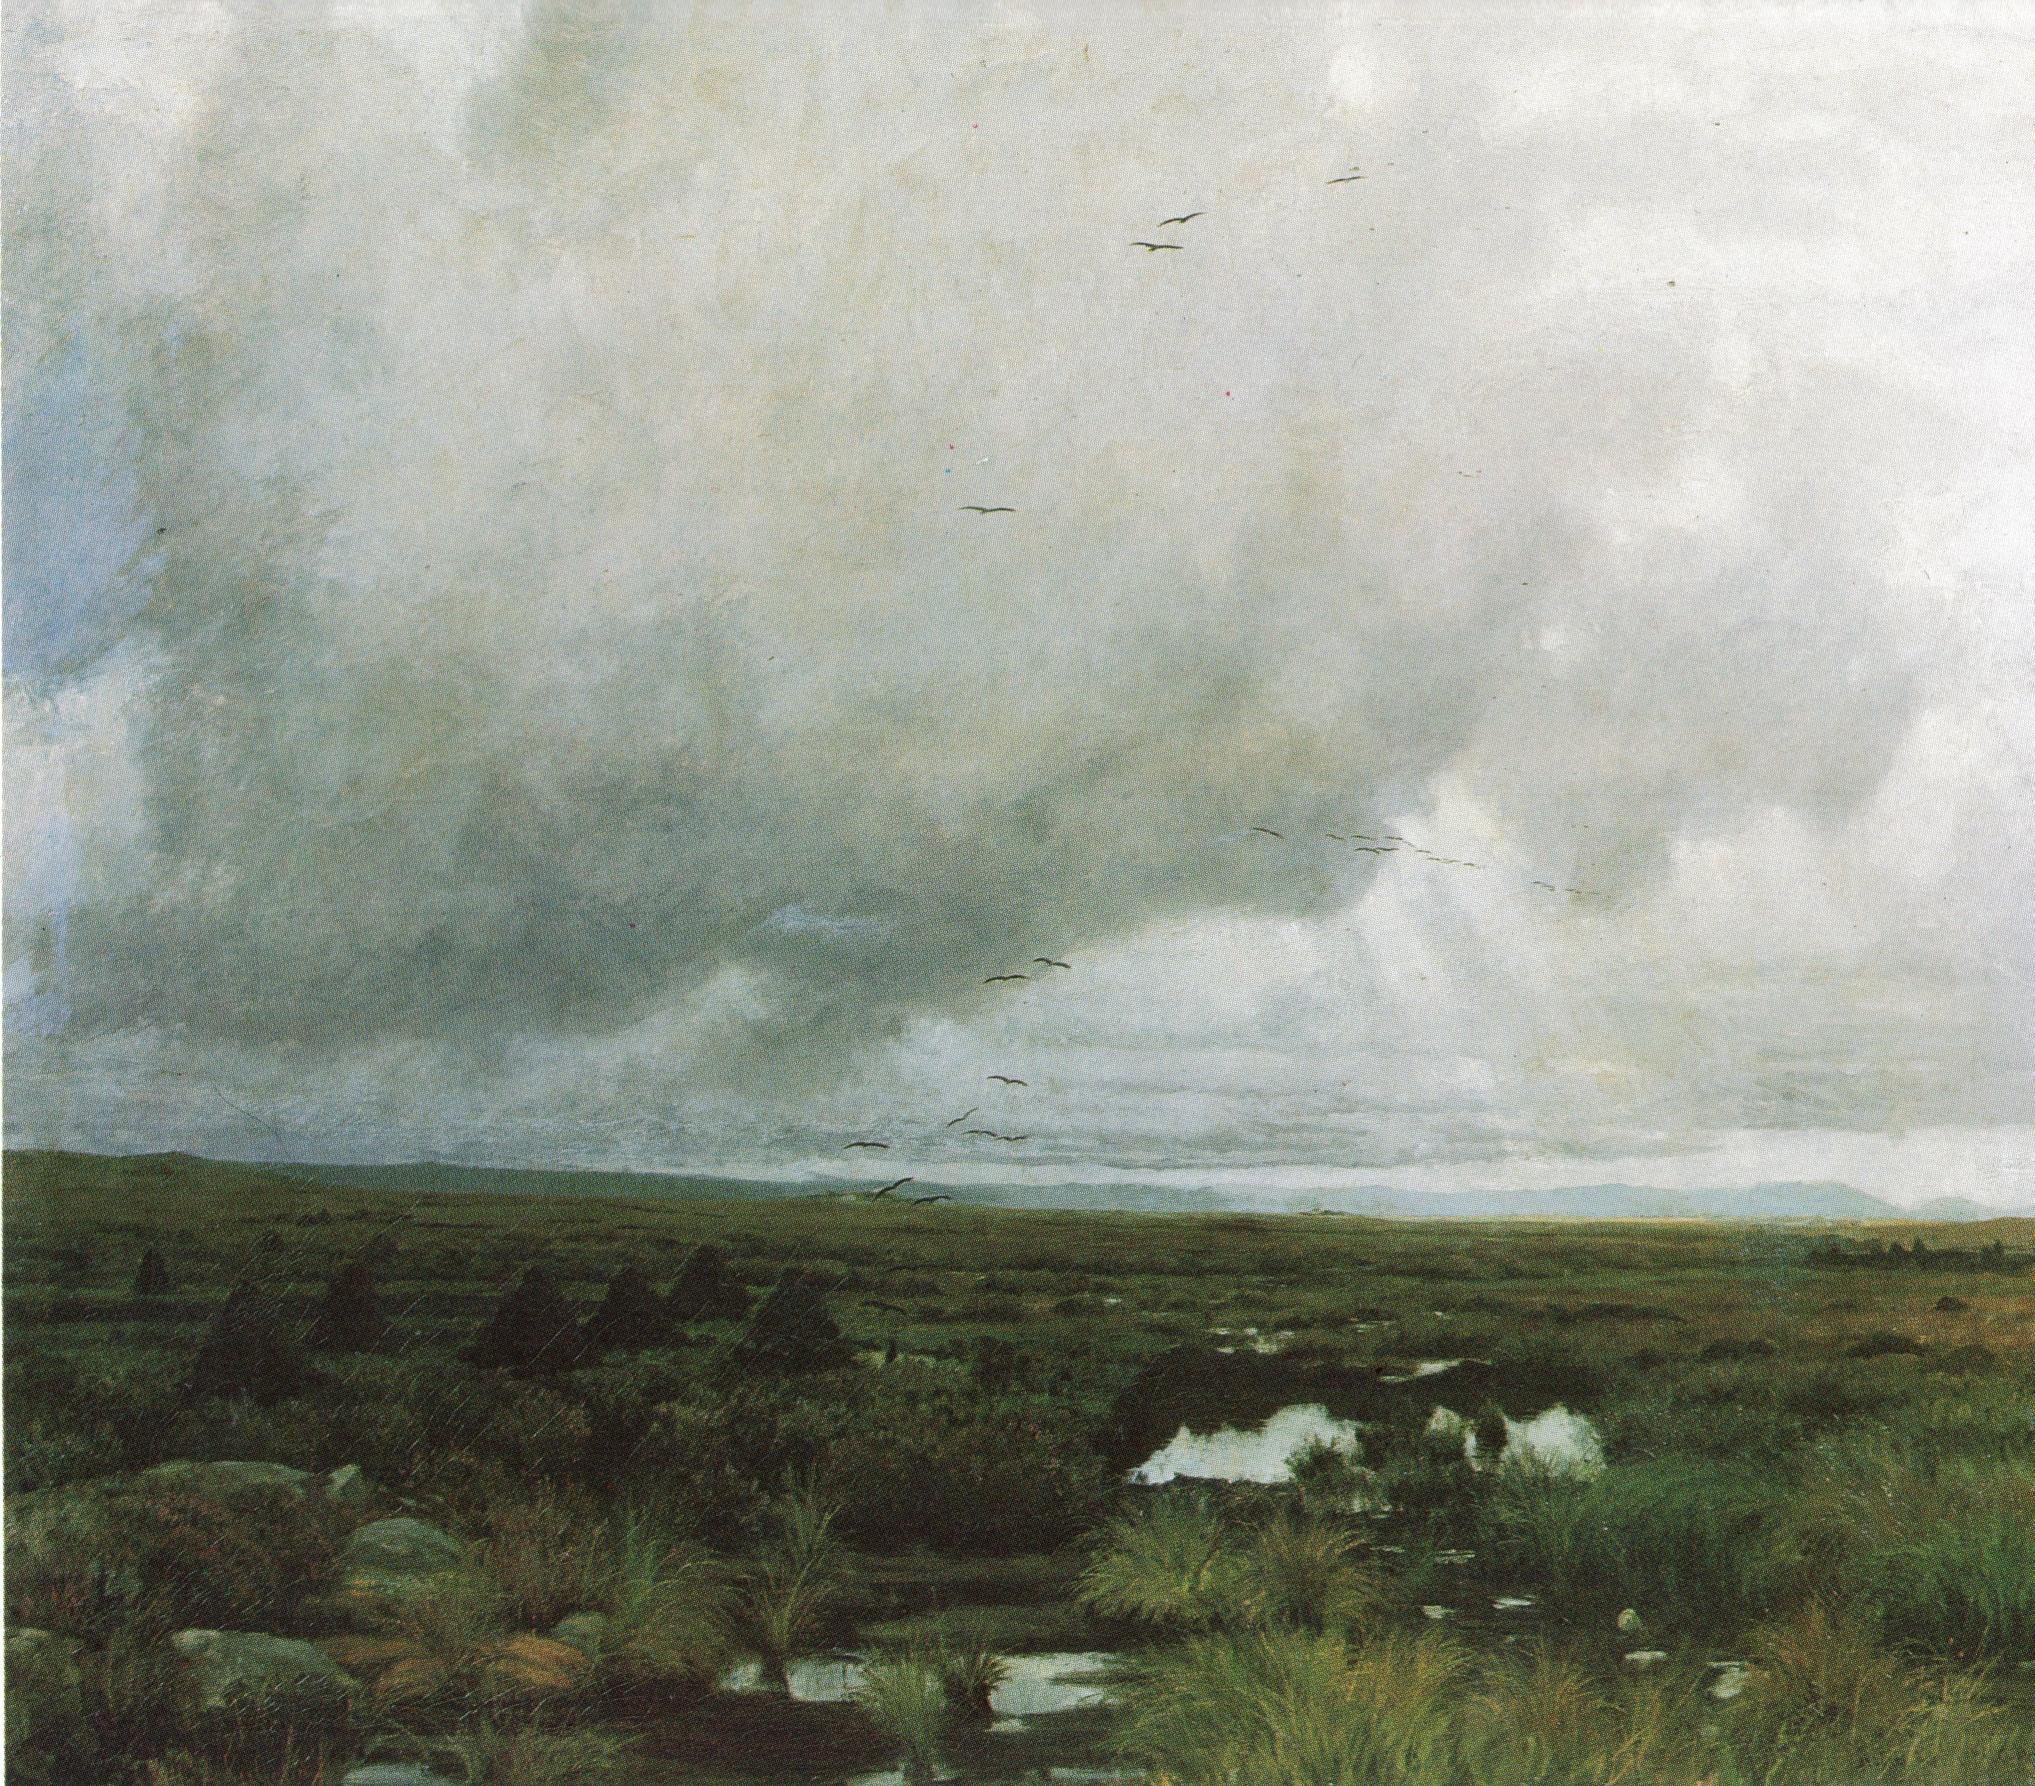 Znalezione obrazy dla zapytania Torvmyr 1880